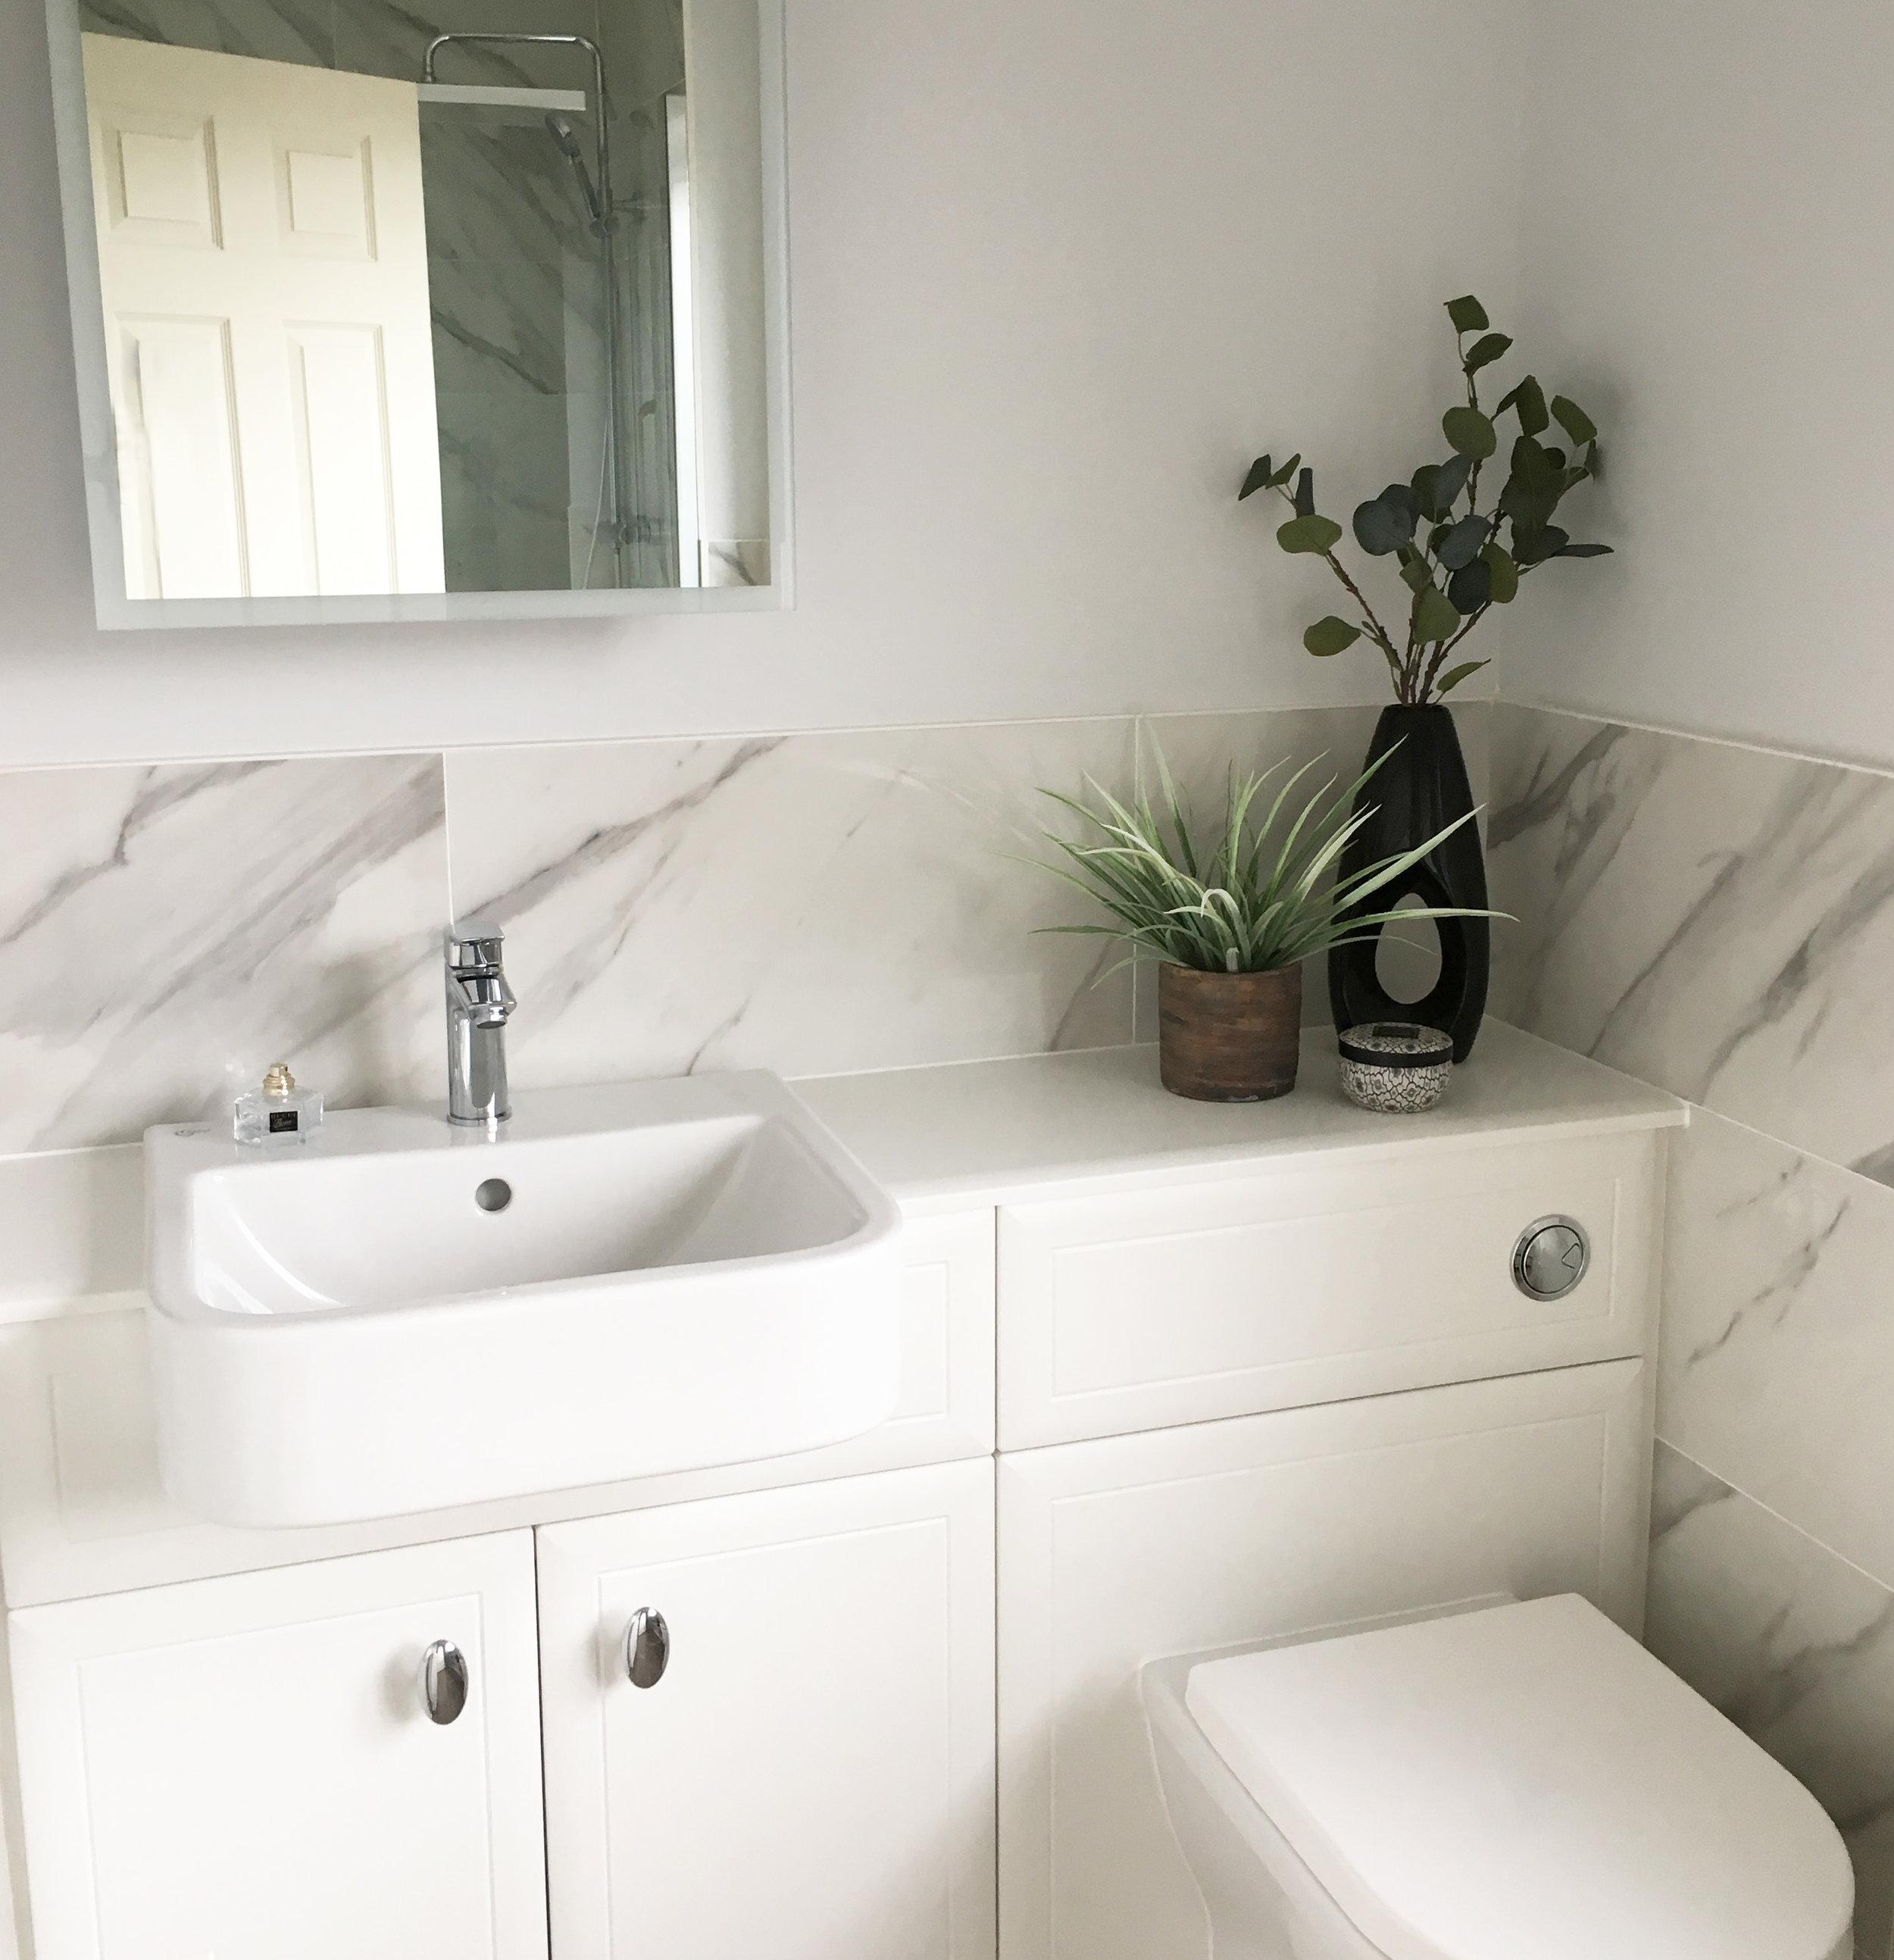 halworth bathroom sink.jpg